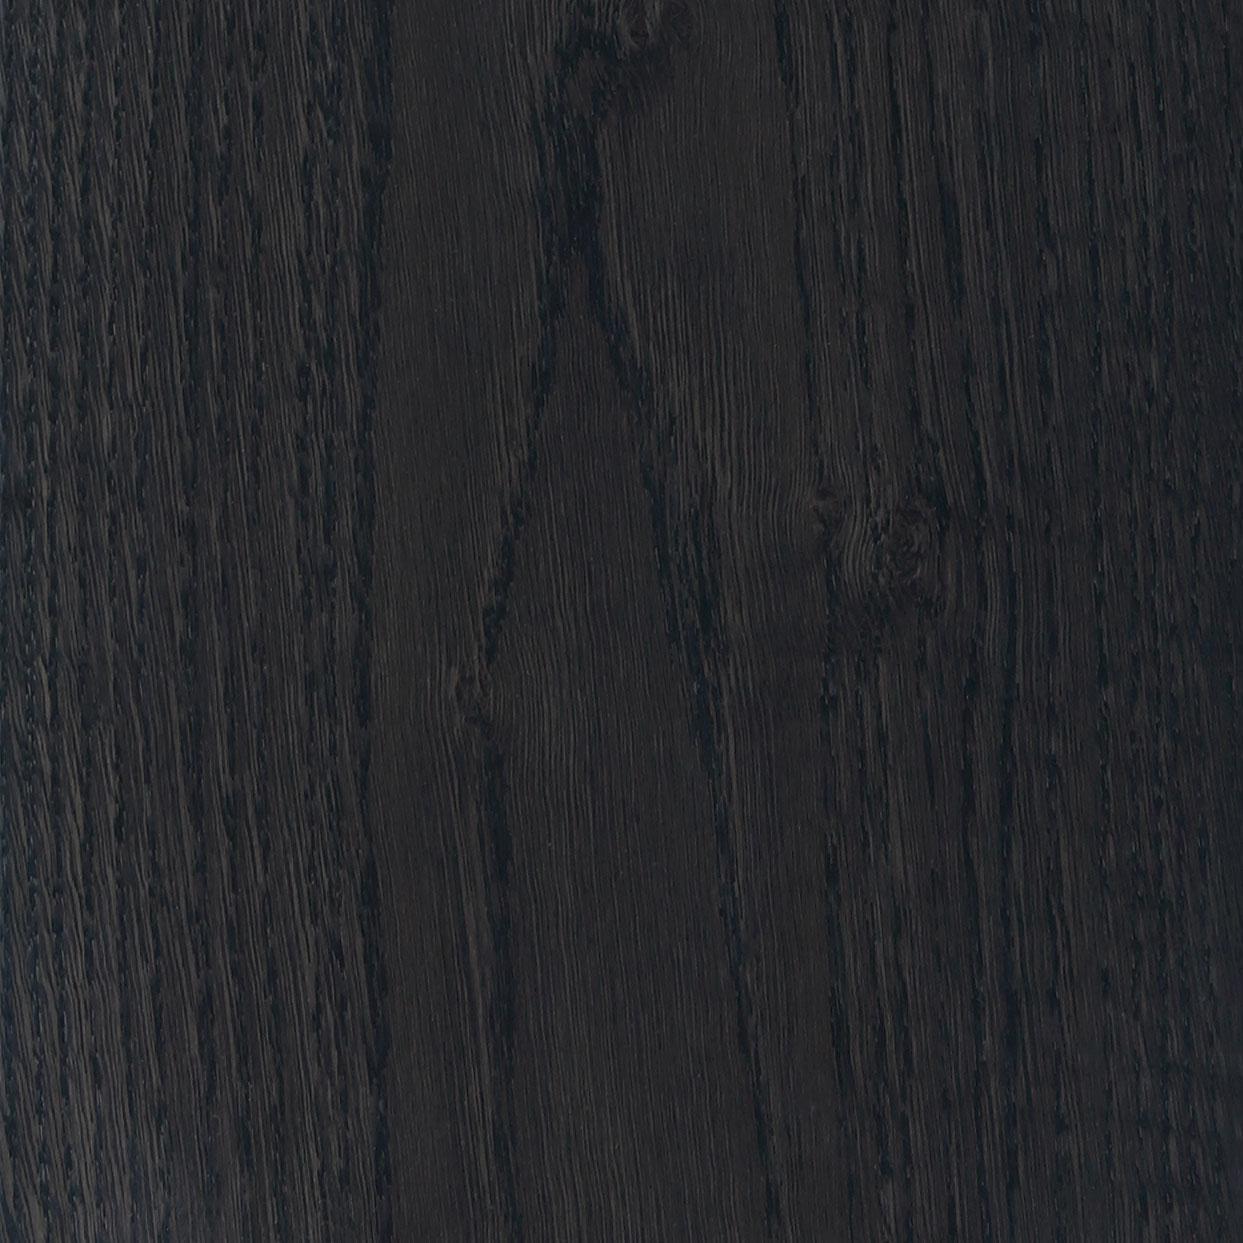 Element7-wide-plank-samples-FormalGreyOak_AJ_883_054